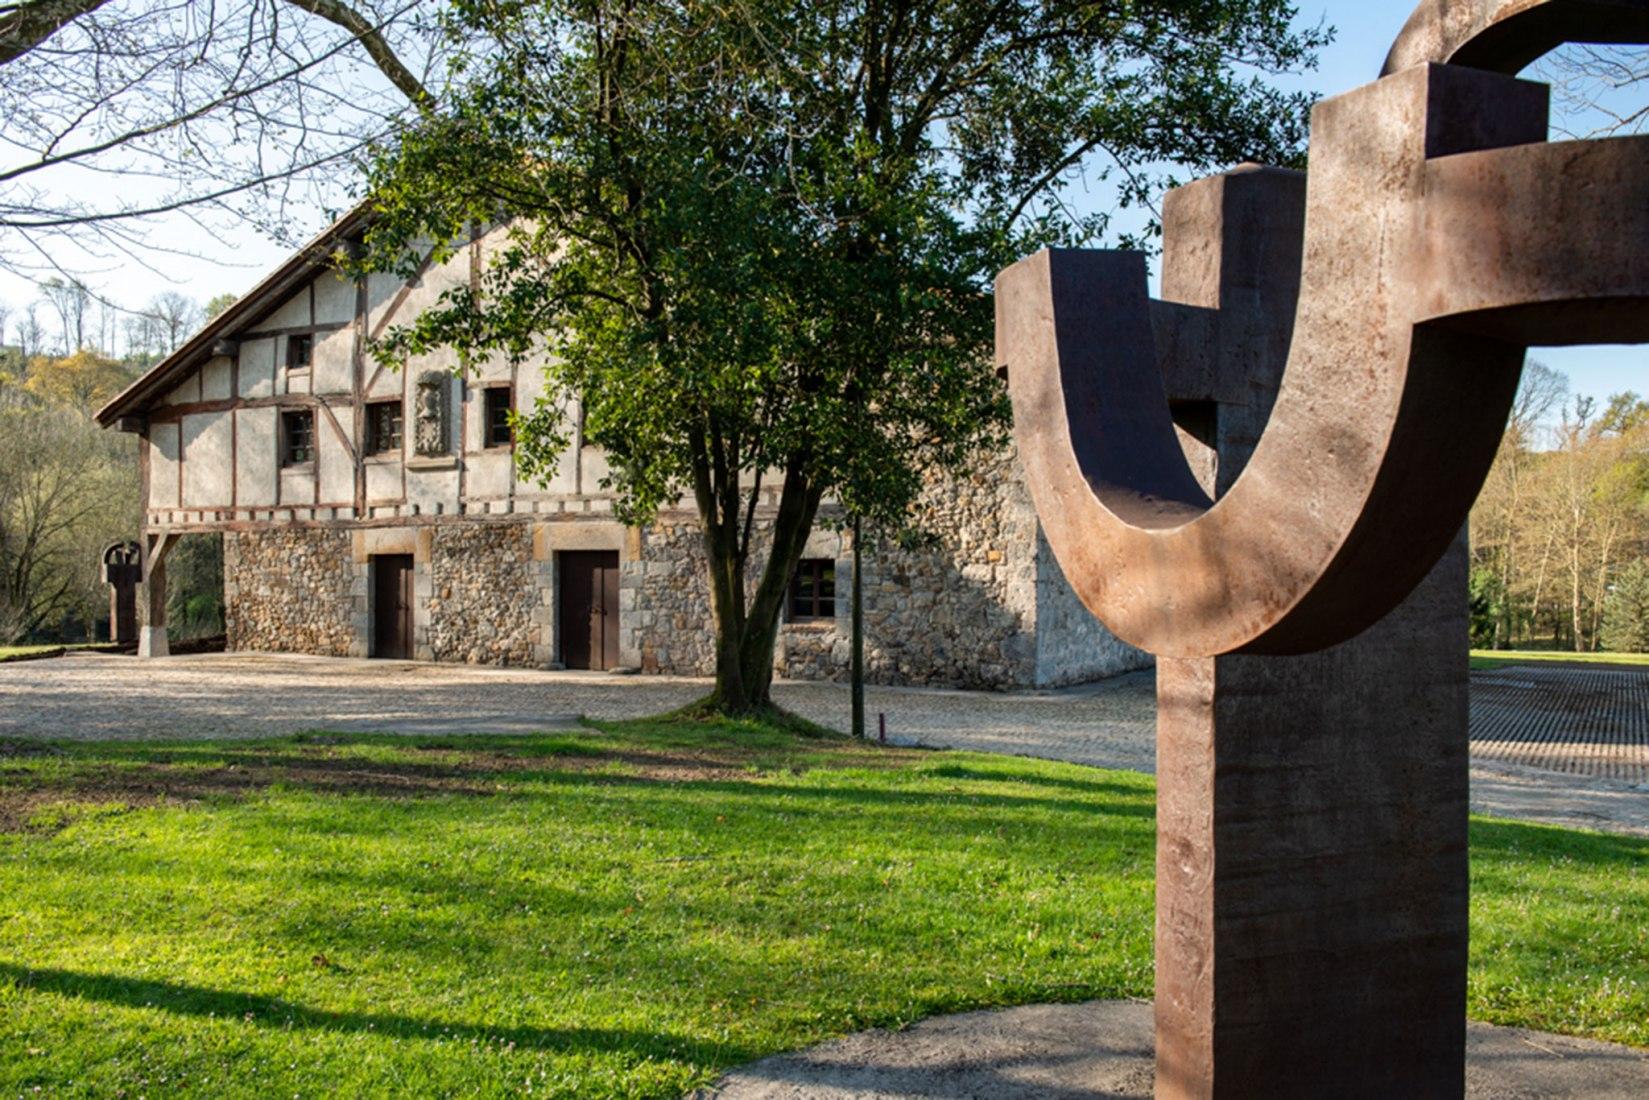 Detail of 'Arch of freedom' ('Arco de la libertad') (corten steel,1993) in front of Zabalaga Farm House 16th century. ©Zabalaga Leku. San Sebastián, VEGAP, 2019. Estate of Eduardo Chillida and Hauser & Wirth. Photo Iñigo Santiago.